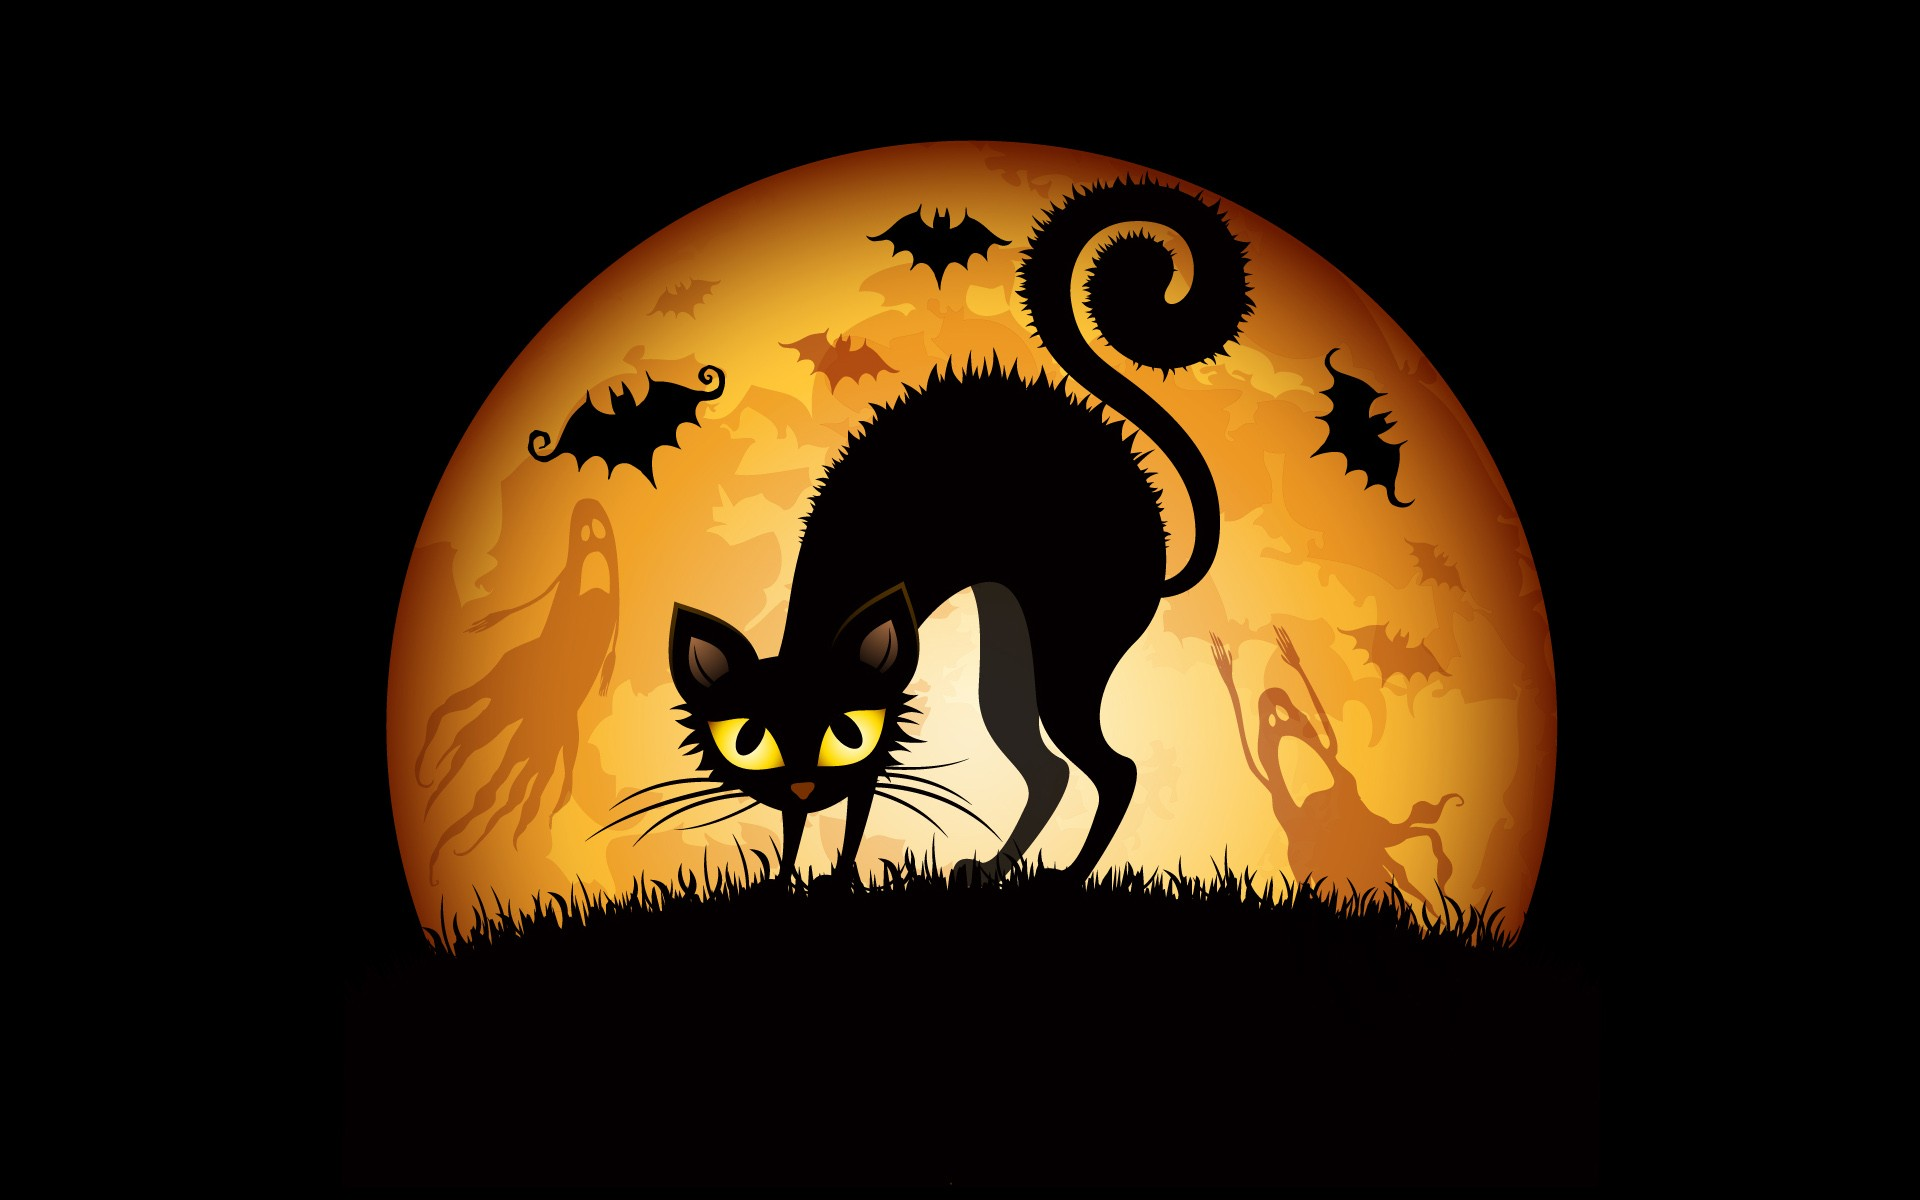 General 1920x1200 Halloween cats animals fantasy art